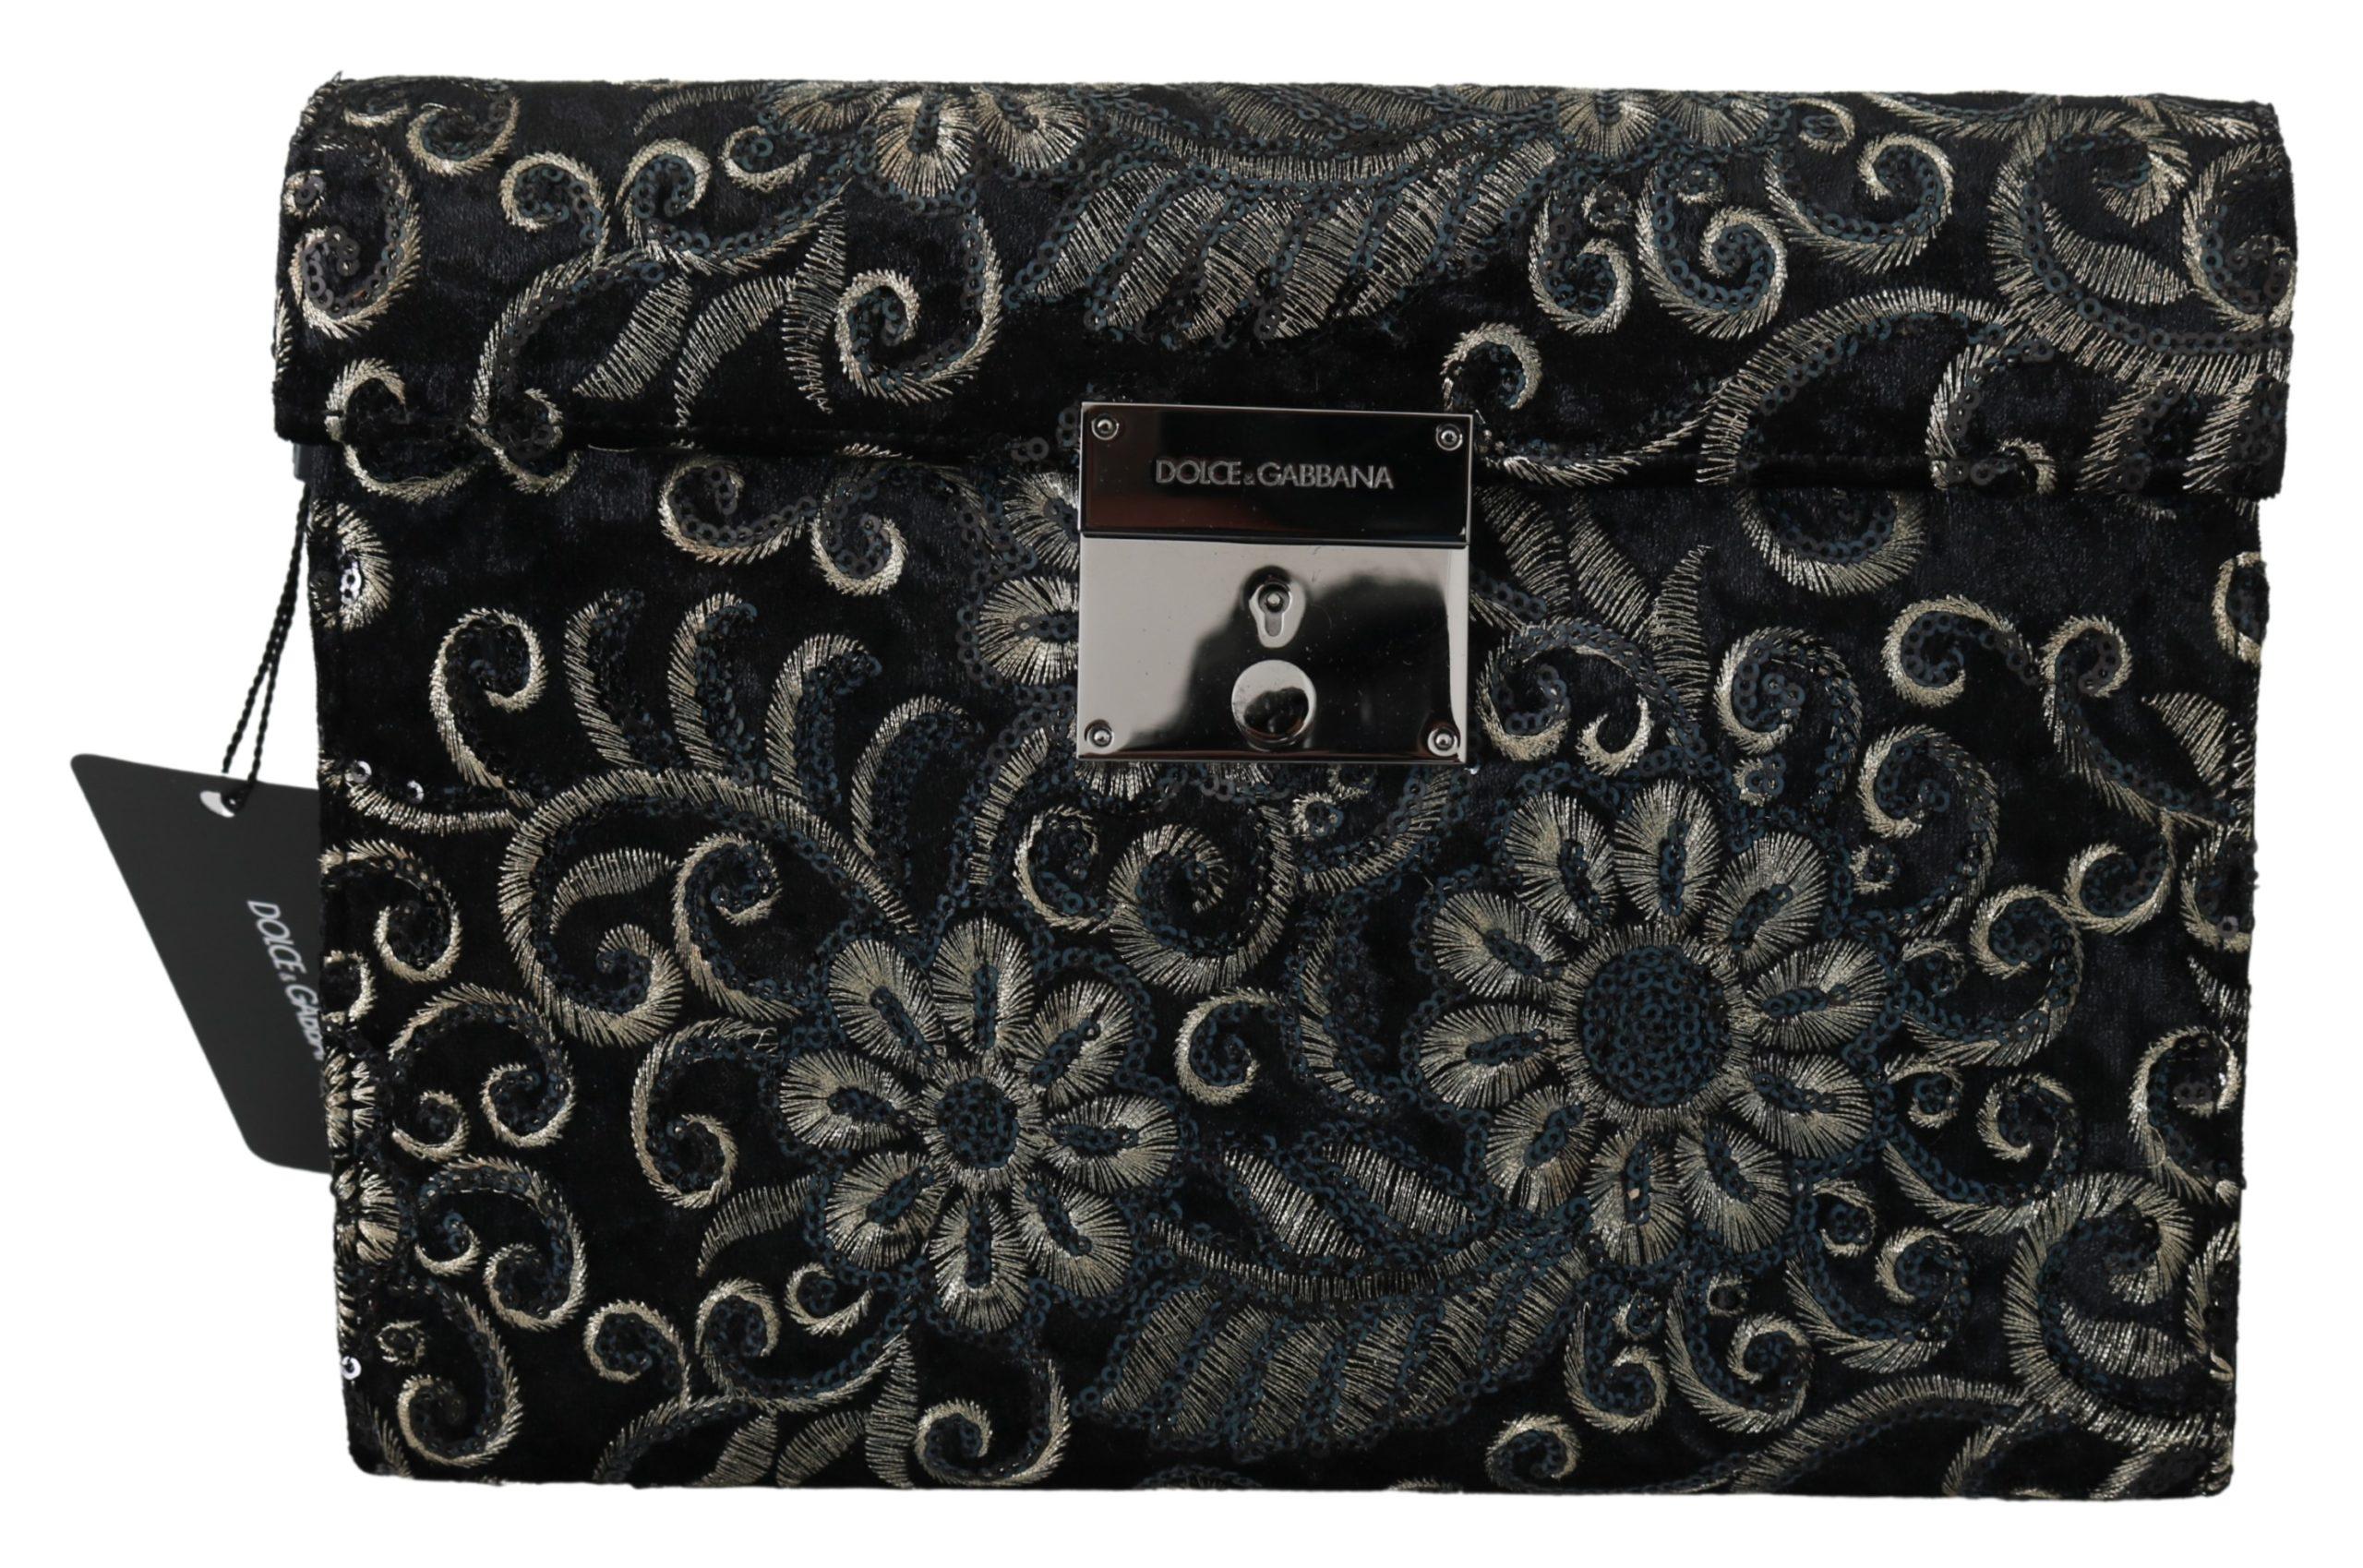 Dolce & Gabbana Men's Ricamo Sequined Leather Briefcase Bag Black VAS9863